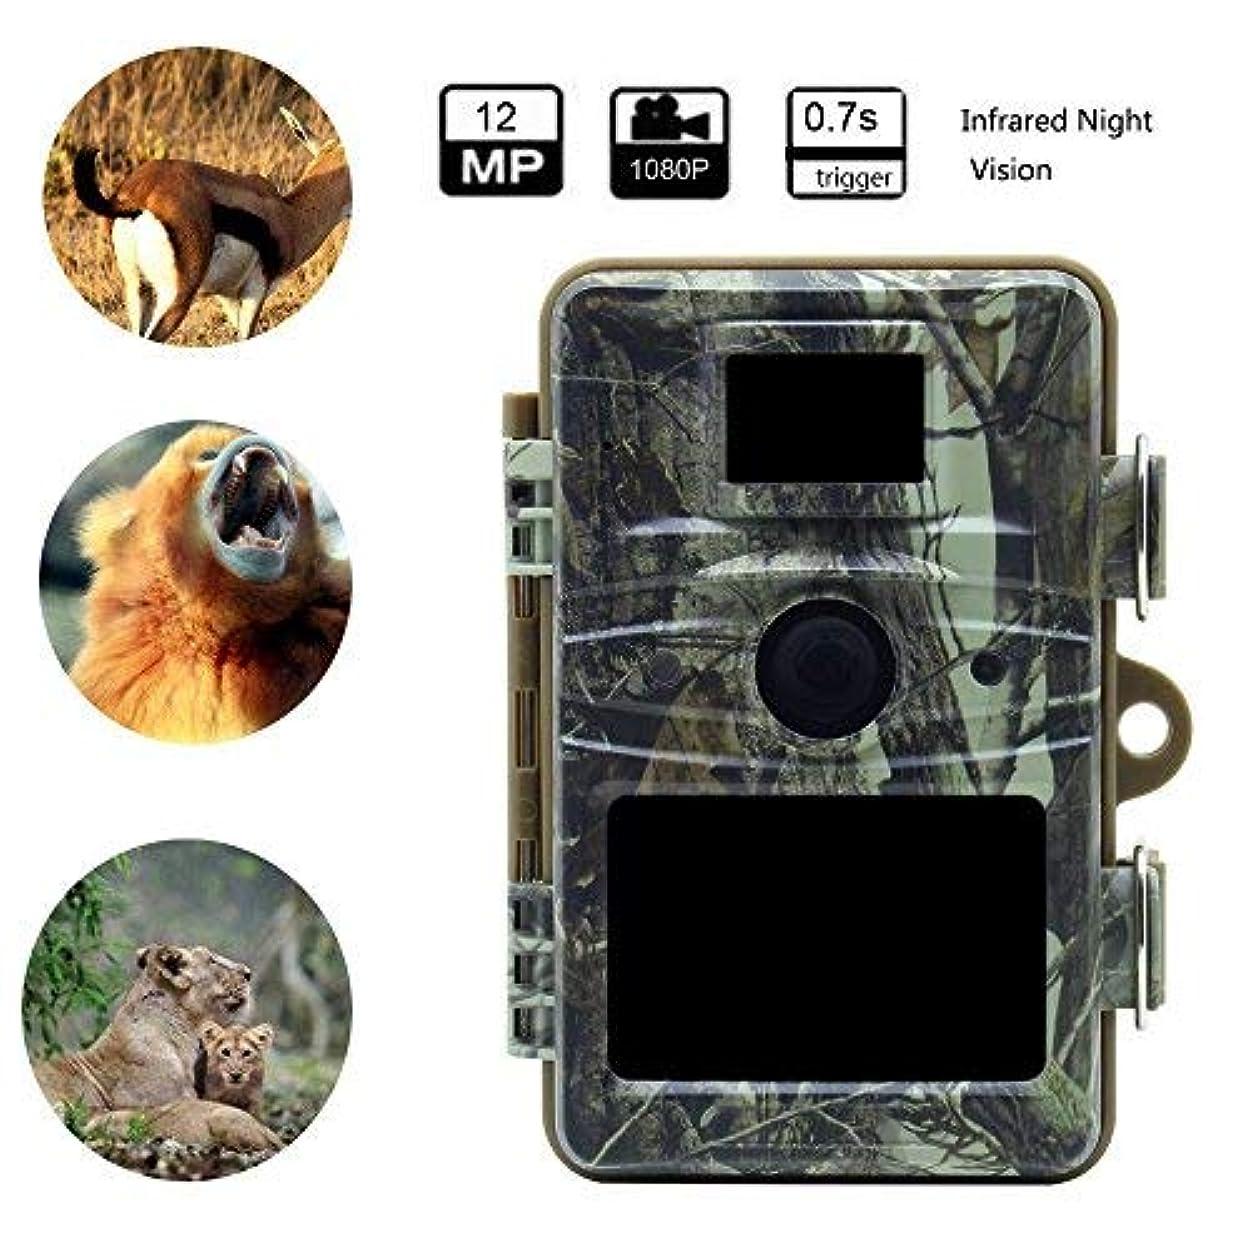 MDTEK@16GB SD Card+ Trail Game Camera RD1005,Hunting Trail Camera Trap 12MP Wildlife Game Cameras HD Night Vision Waterproof IP66 Hunter Trail Camera anhk946333778